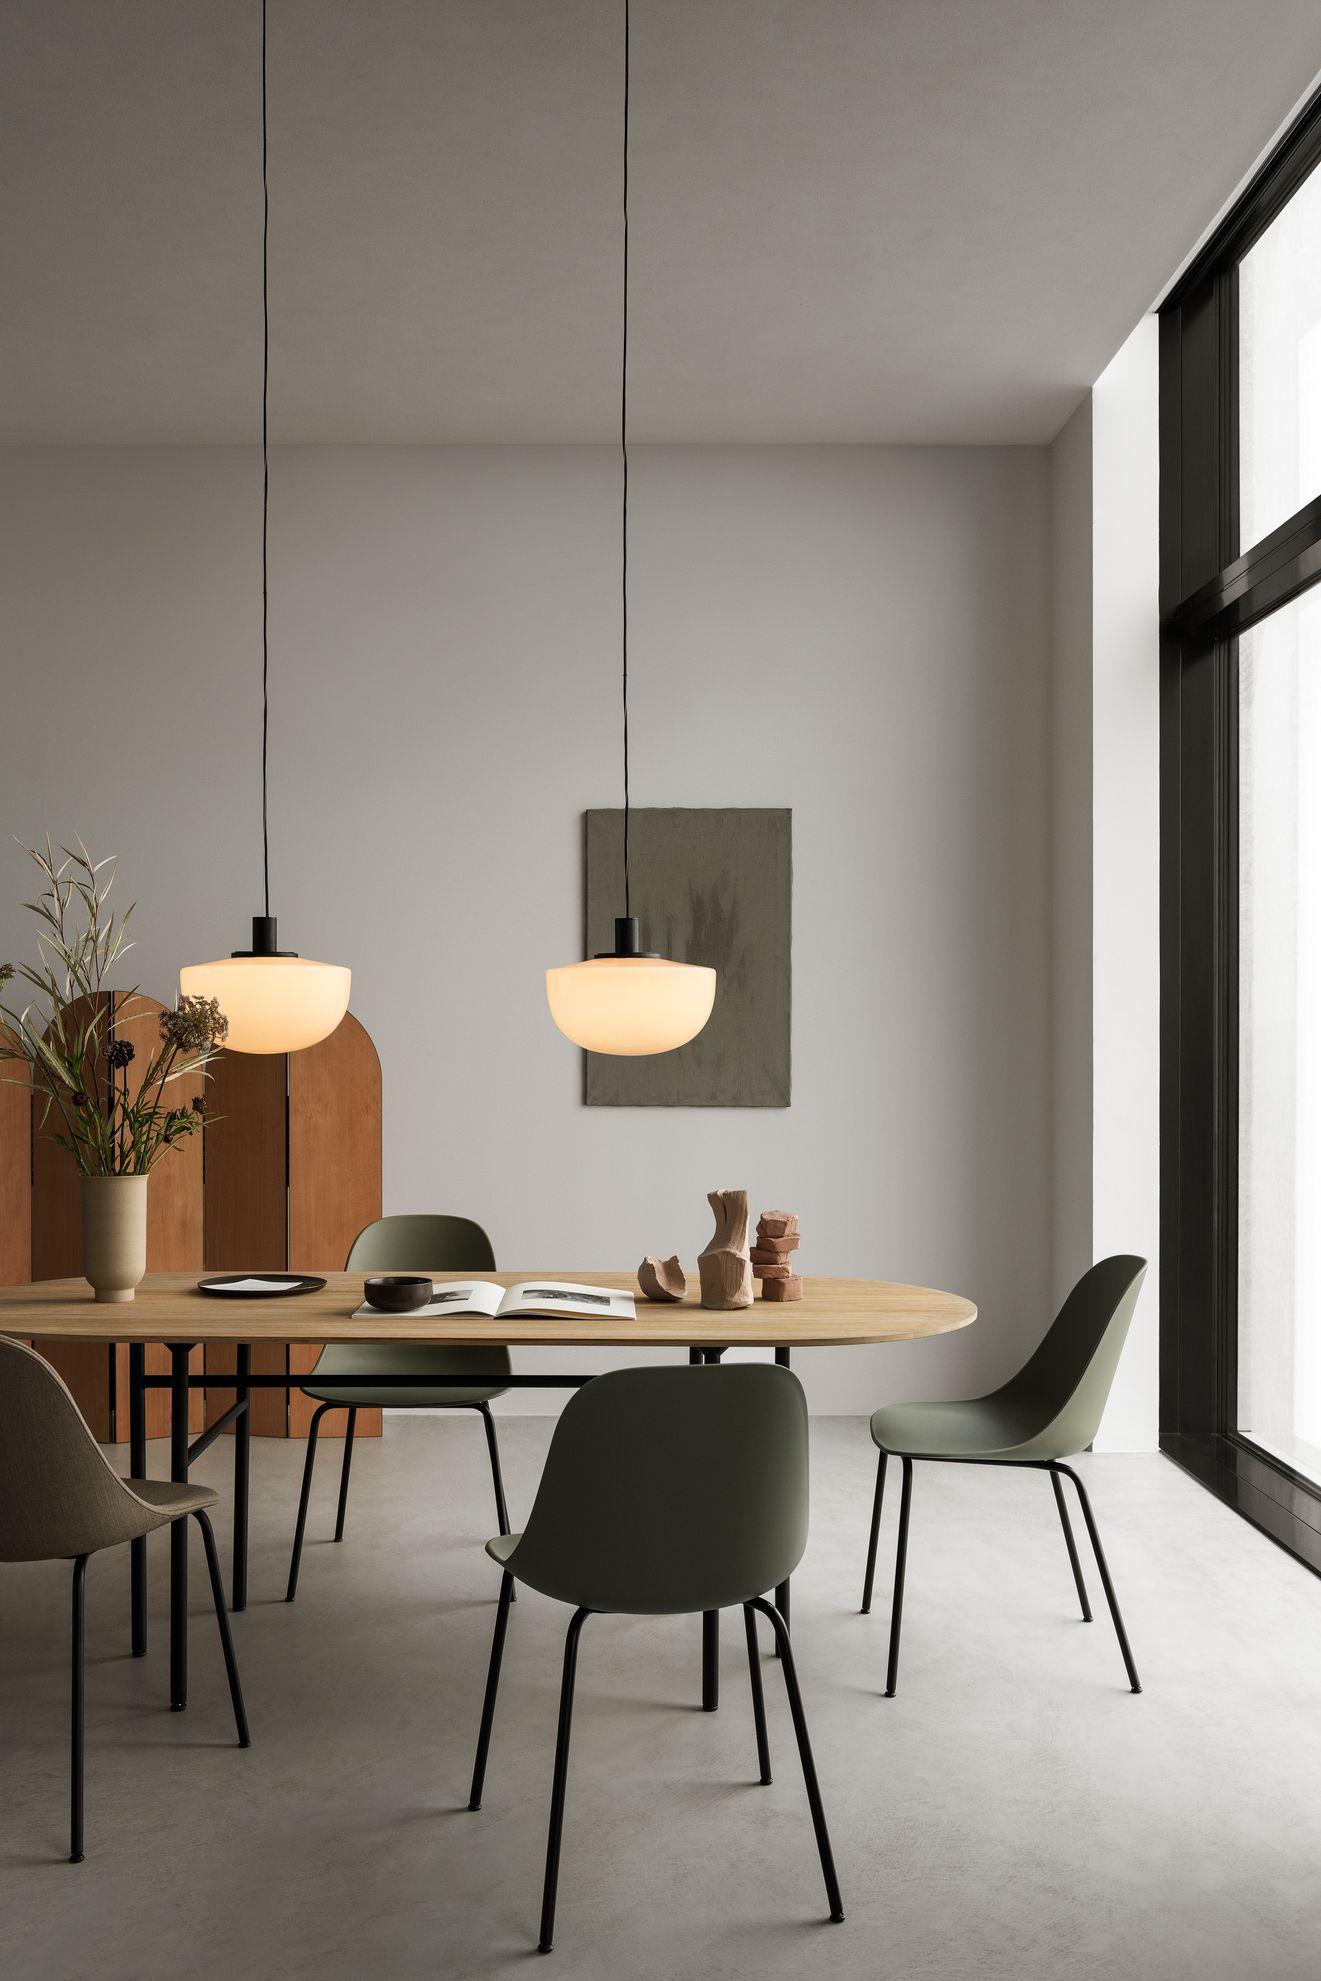 Aesthetic Interior Minimal Design Manilva Co House Interior Modern Dining Room Minimalism Interior